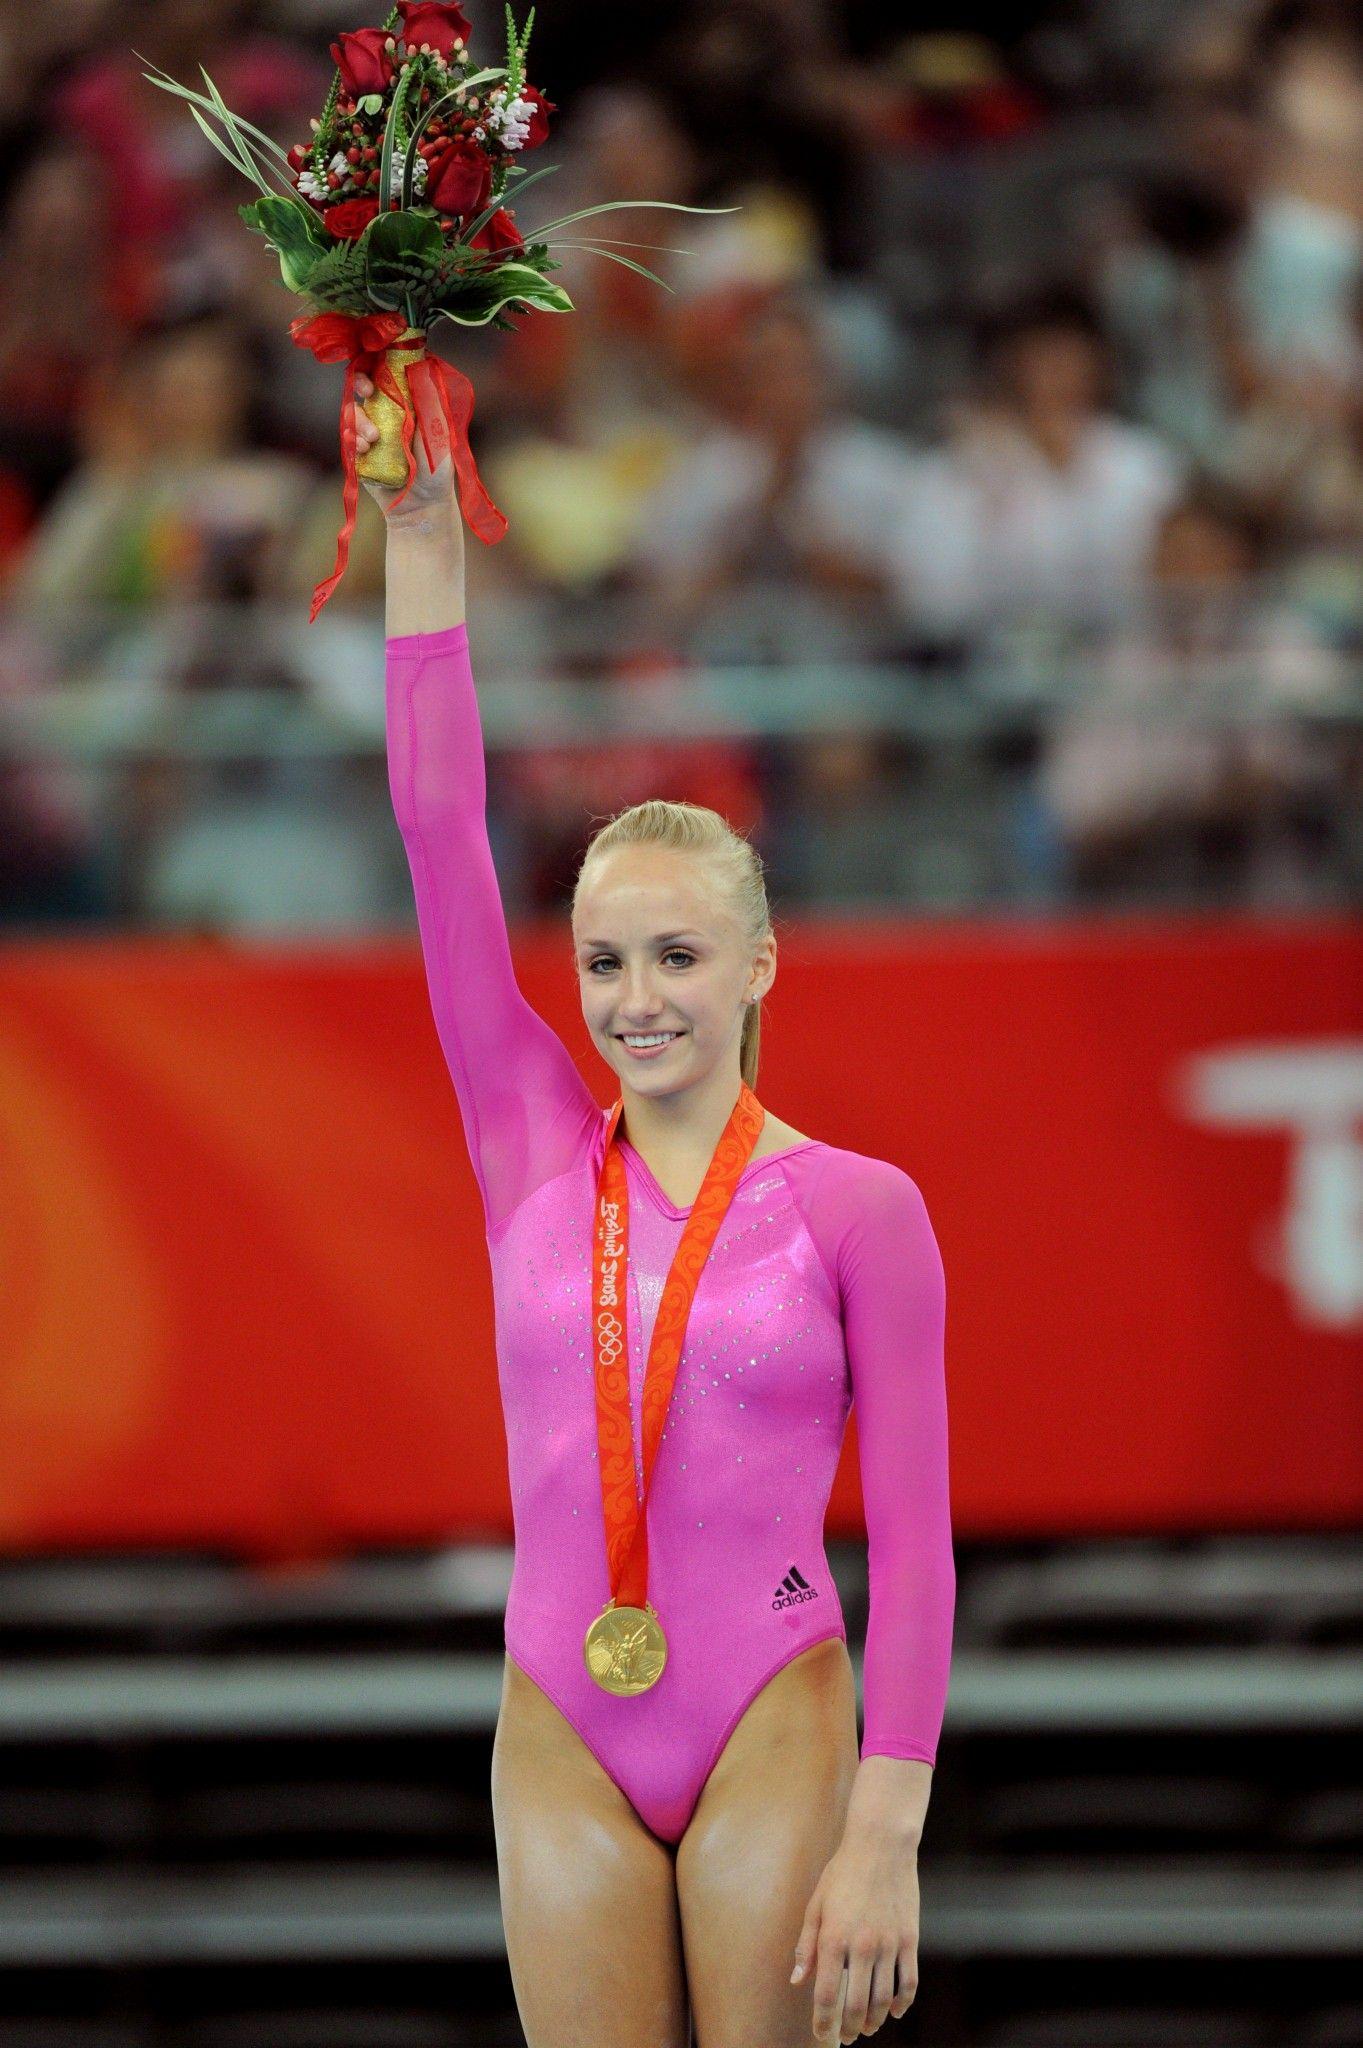 Gymnastic Leotard Slips